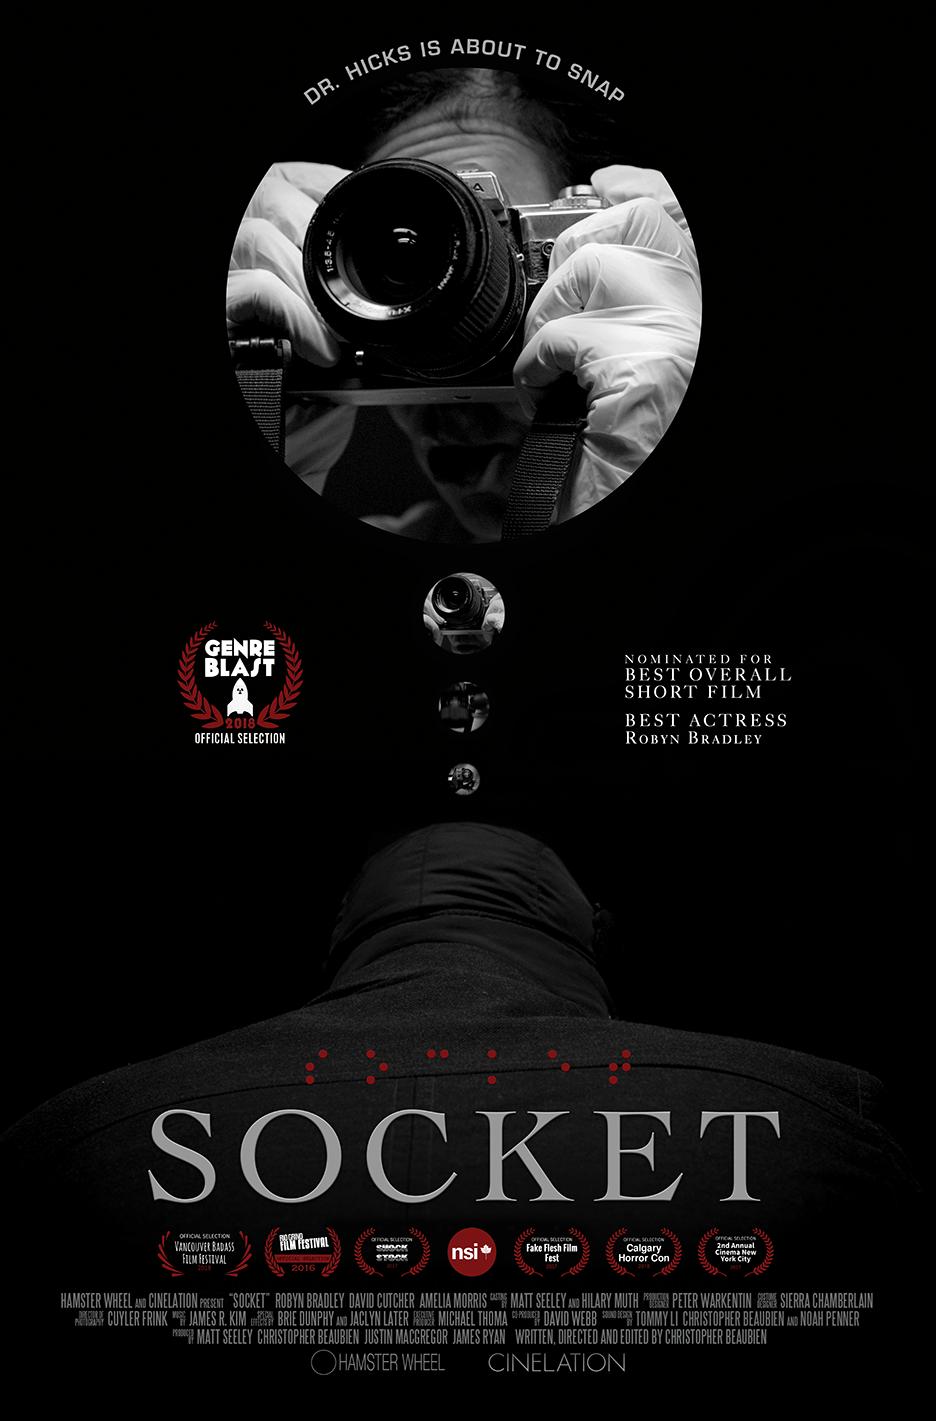 Socket_Poster_Large005_RGB_144_w936.png